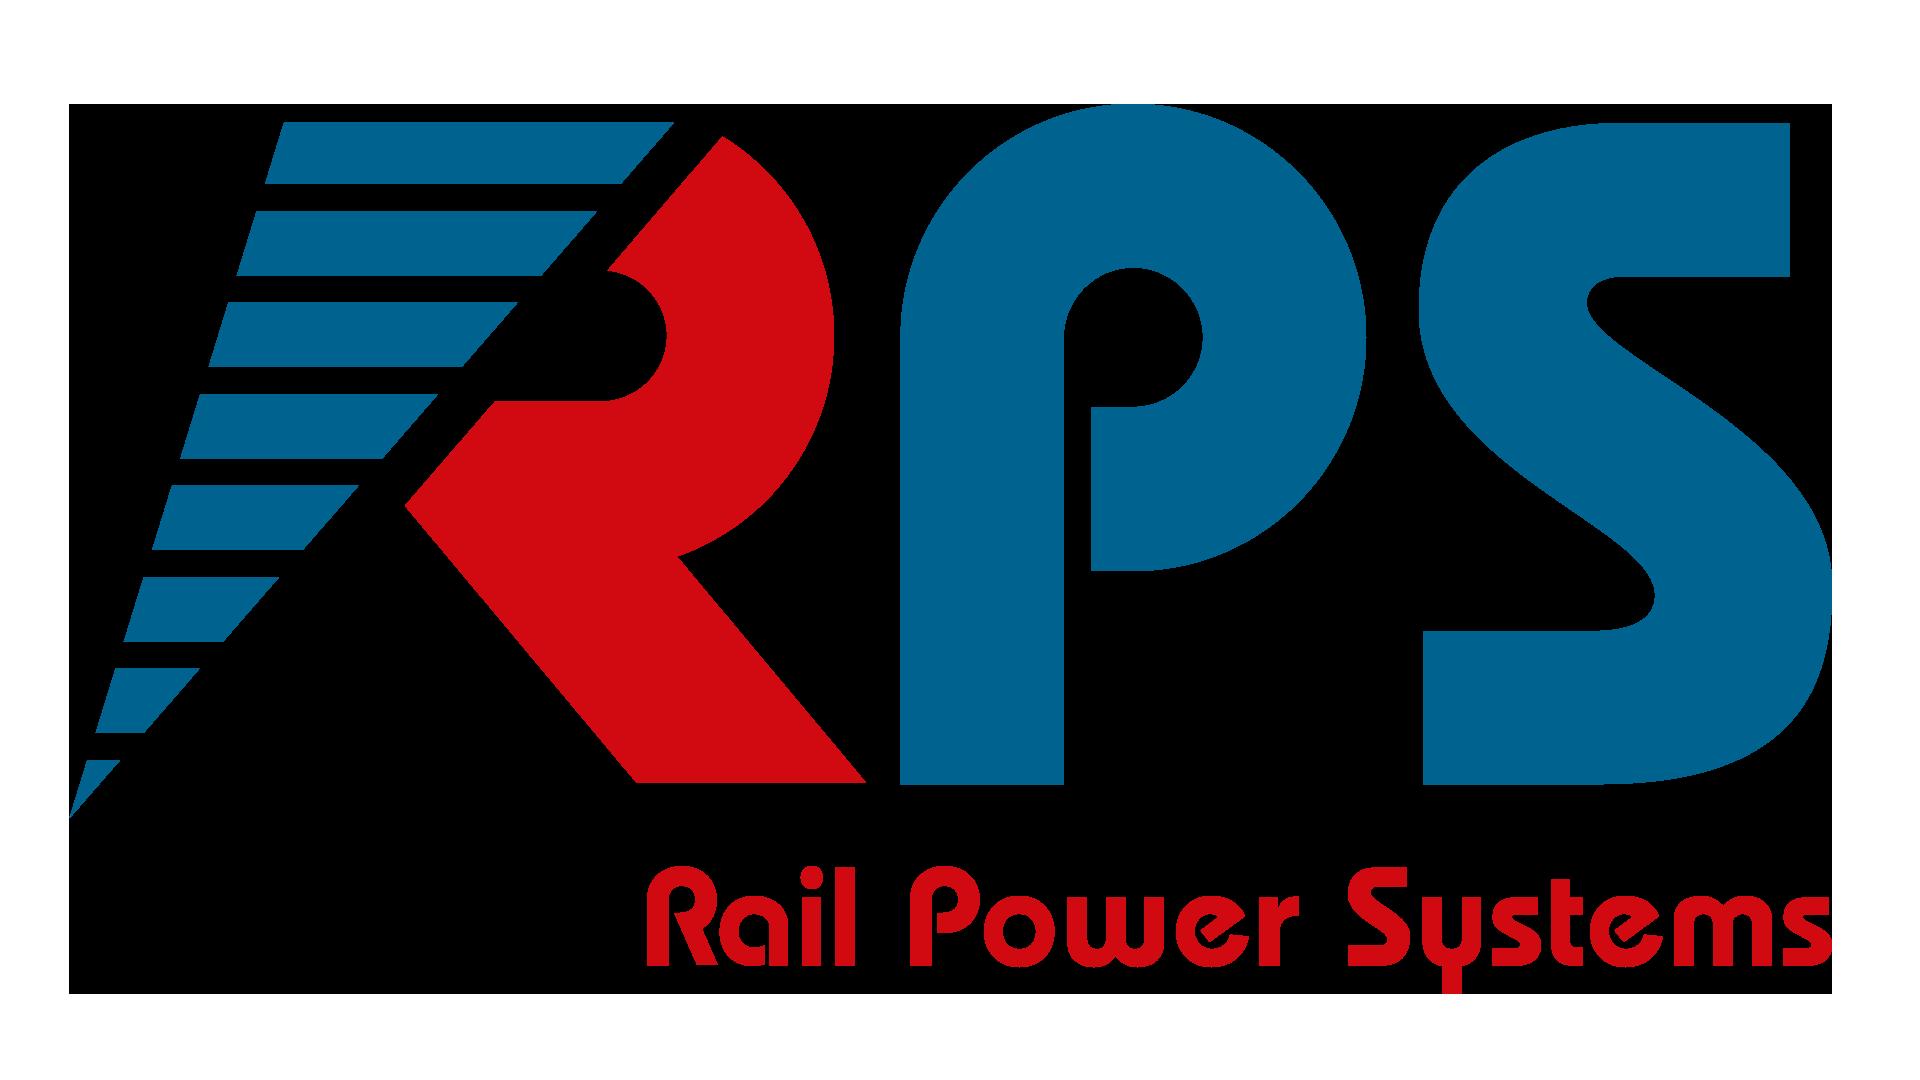 Rail Power System GmbH